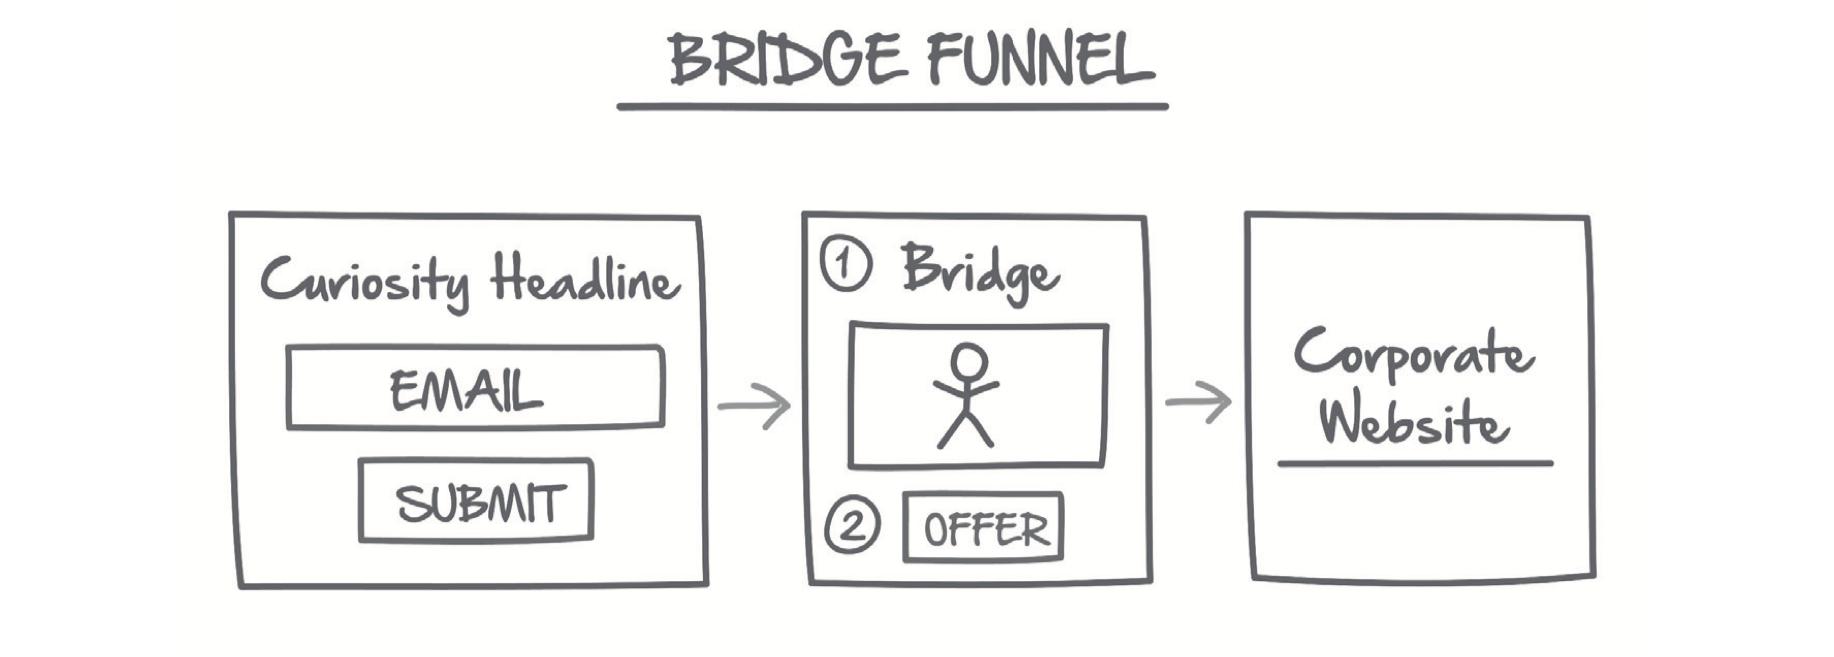 Bridge Funnel Flow